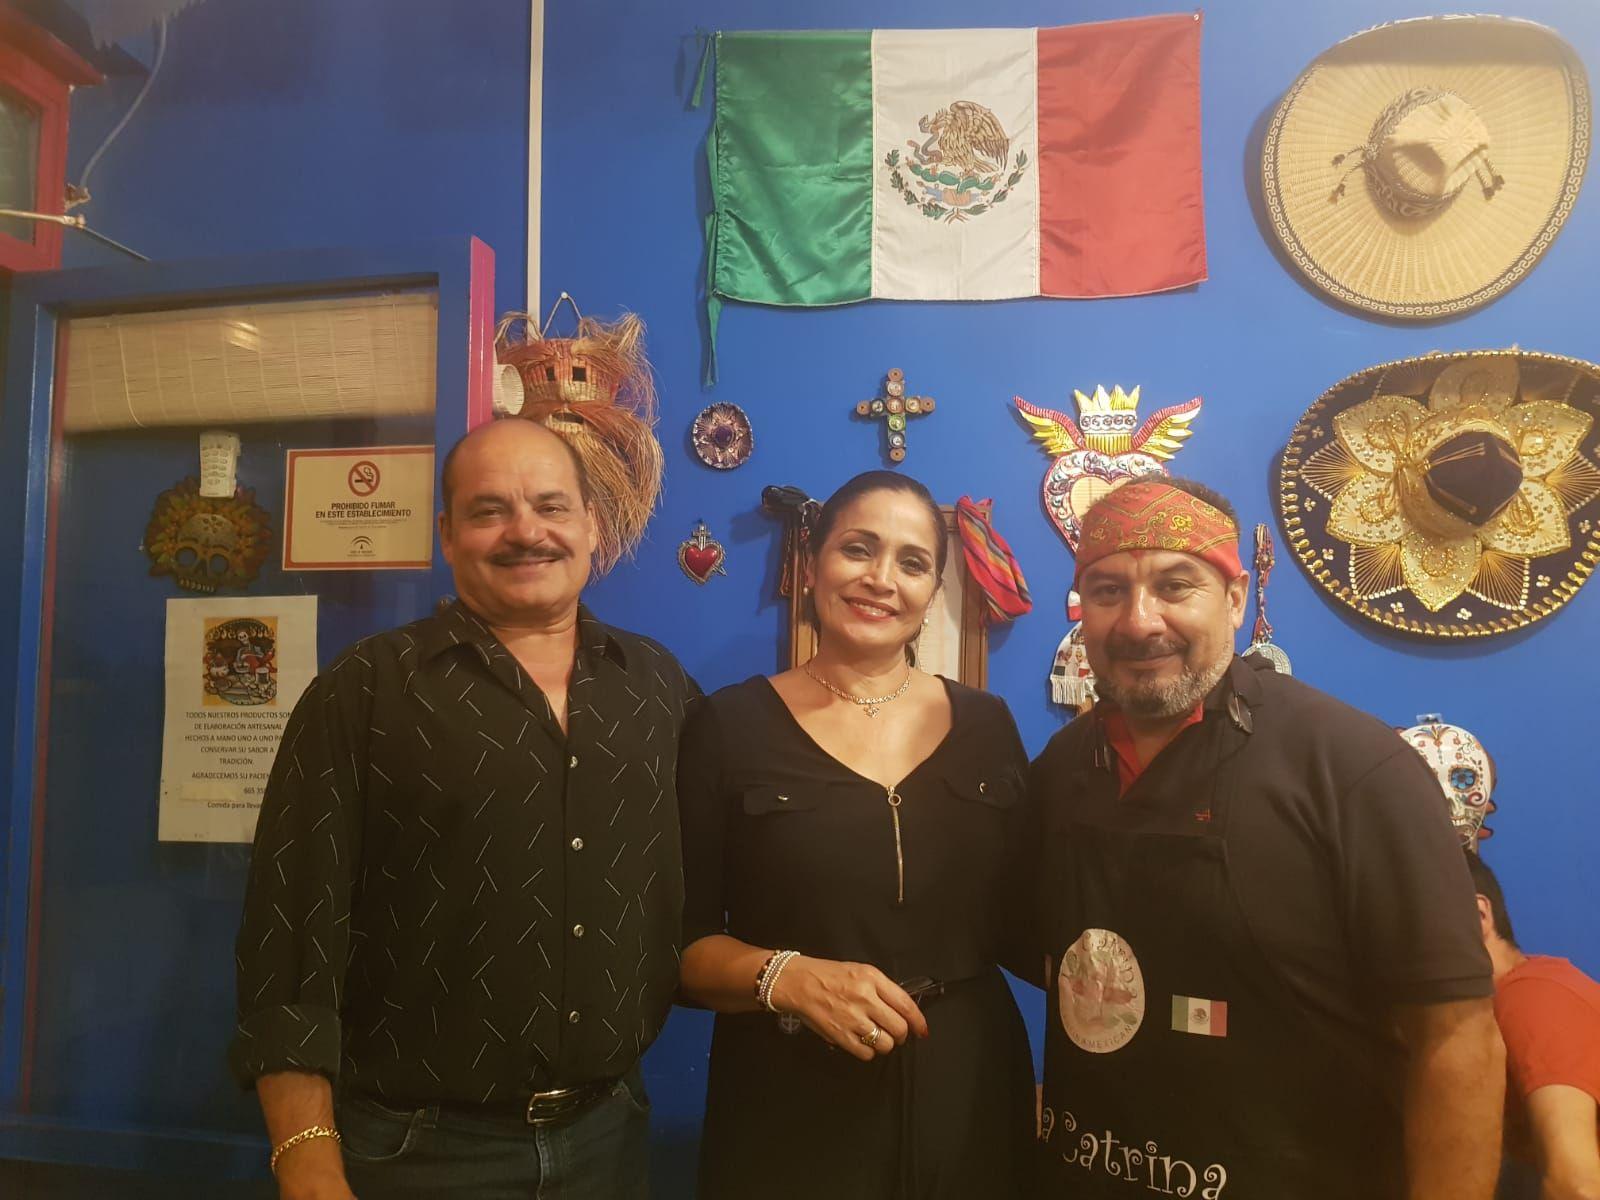 Foto 24 de Restaurante mexicano en  | Cantina La Catrina